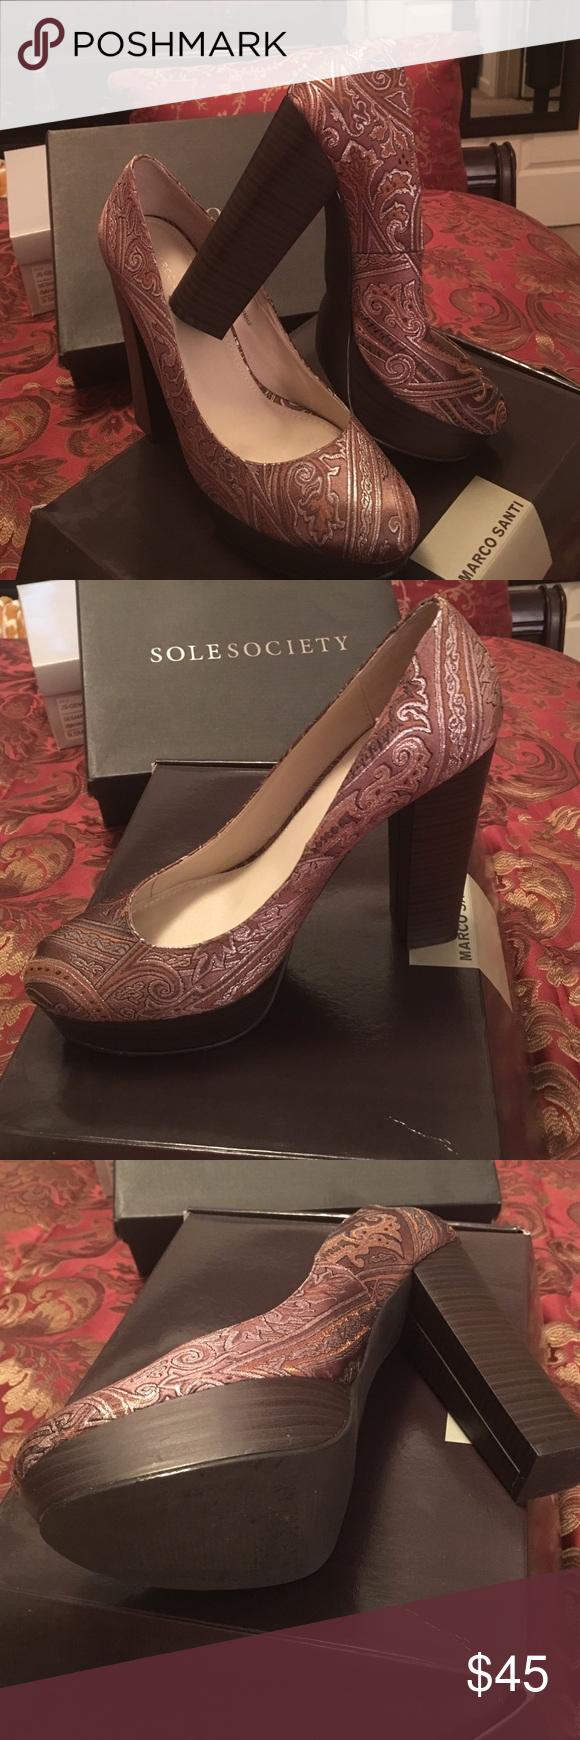 🔥💥FINAL PRICE DROP💥🔥Marco Santi-Sole Society Bronze Fabric Pump worn once Marco Santi Shoes Platforms